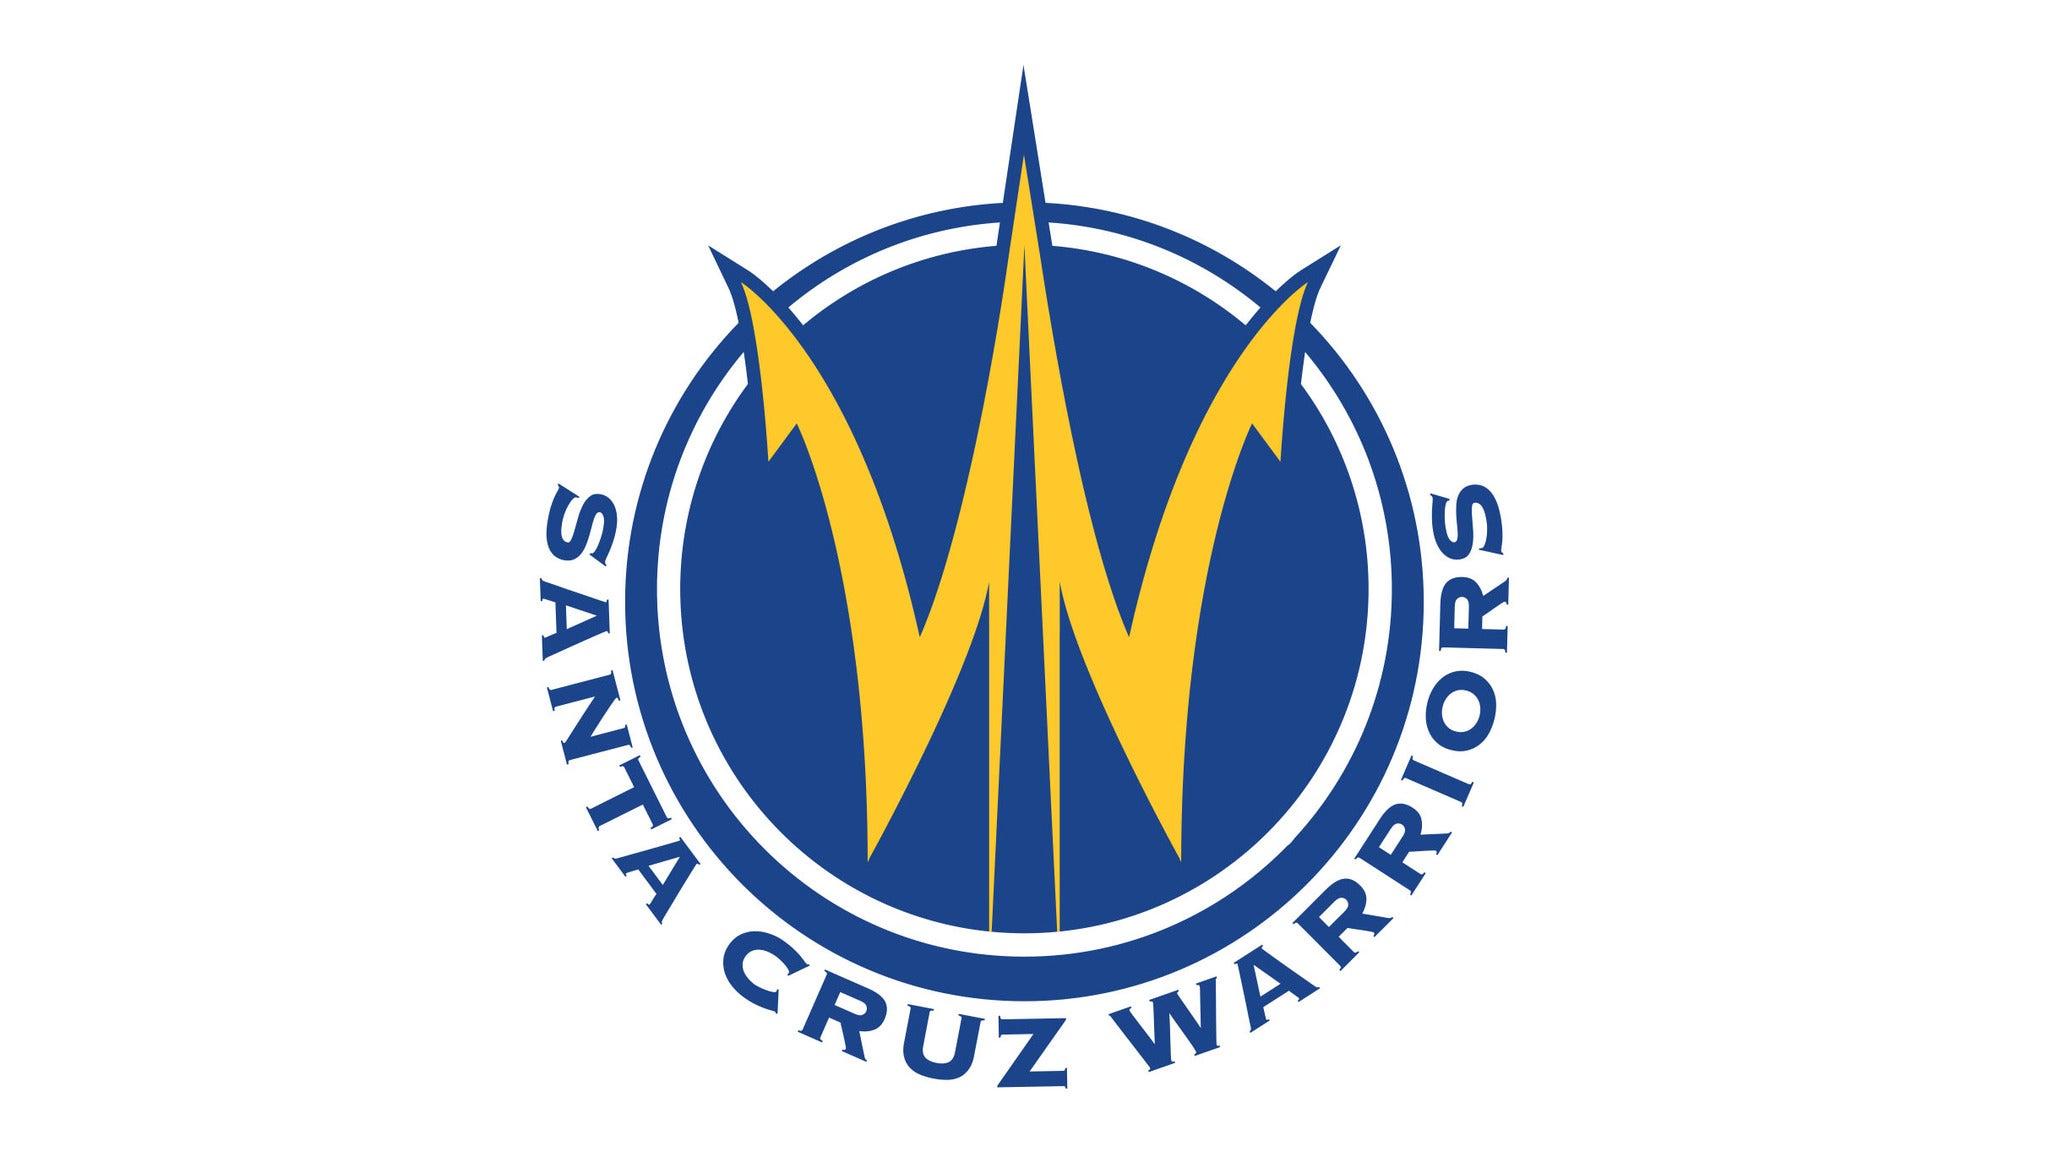 Santa Cruz Warriors pre-sale password for show tickets in San Francisco, CA (Chase Center)